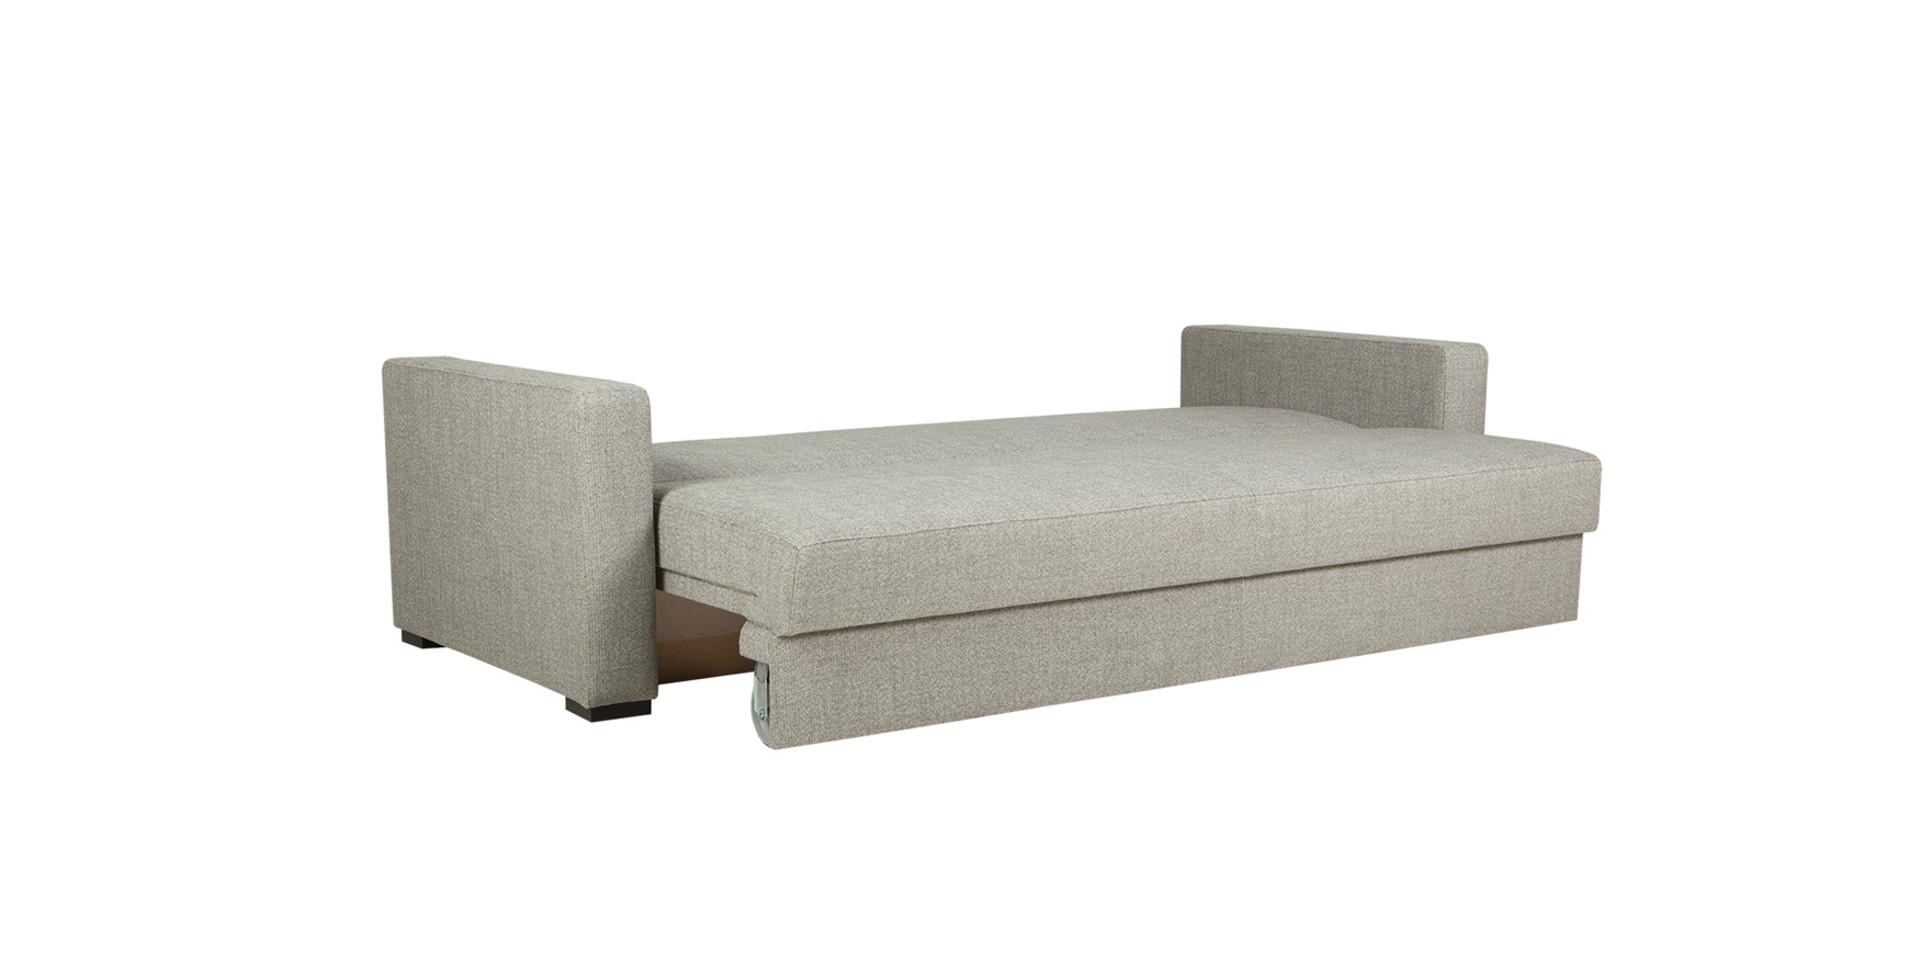 sits-puk-canape-convertible-sofa_bed_origin51_light_grey_10